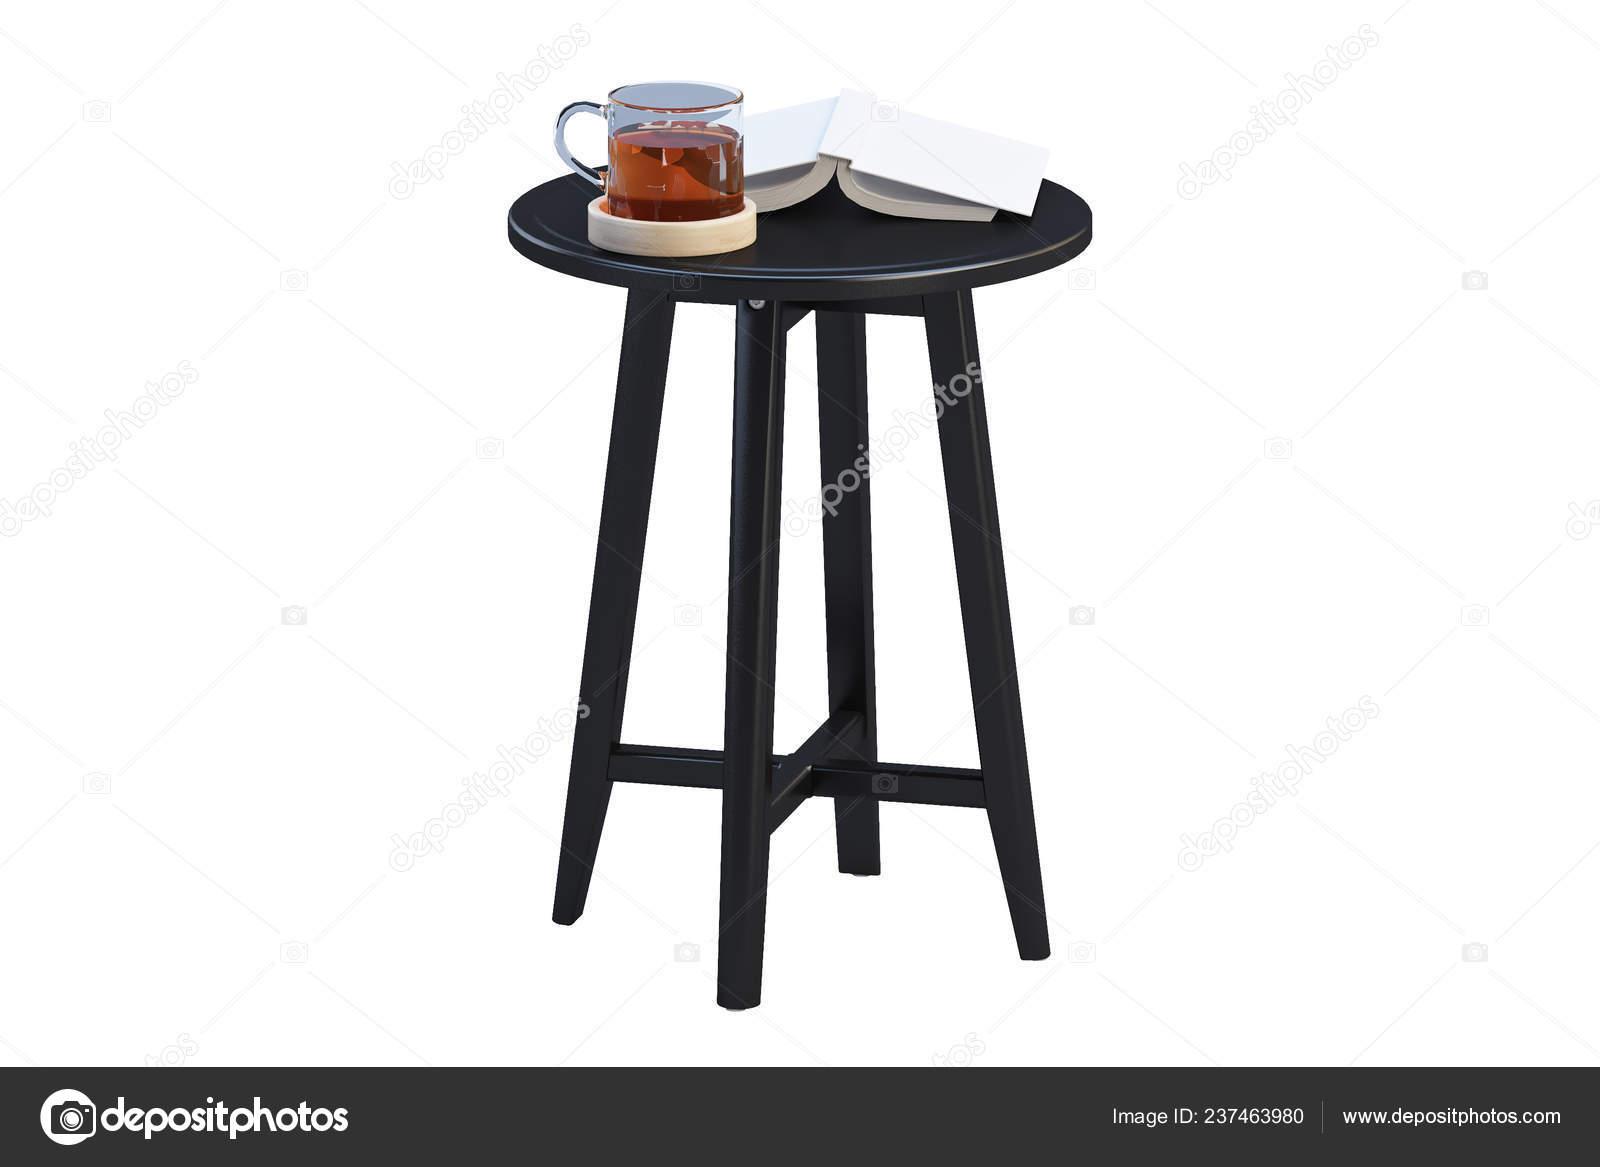 Picture of: Modern Black Coffee Table Books Thin Legs White Background Render Stock Photo C 3dmitruk 237463980